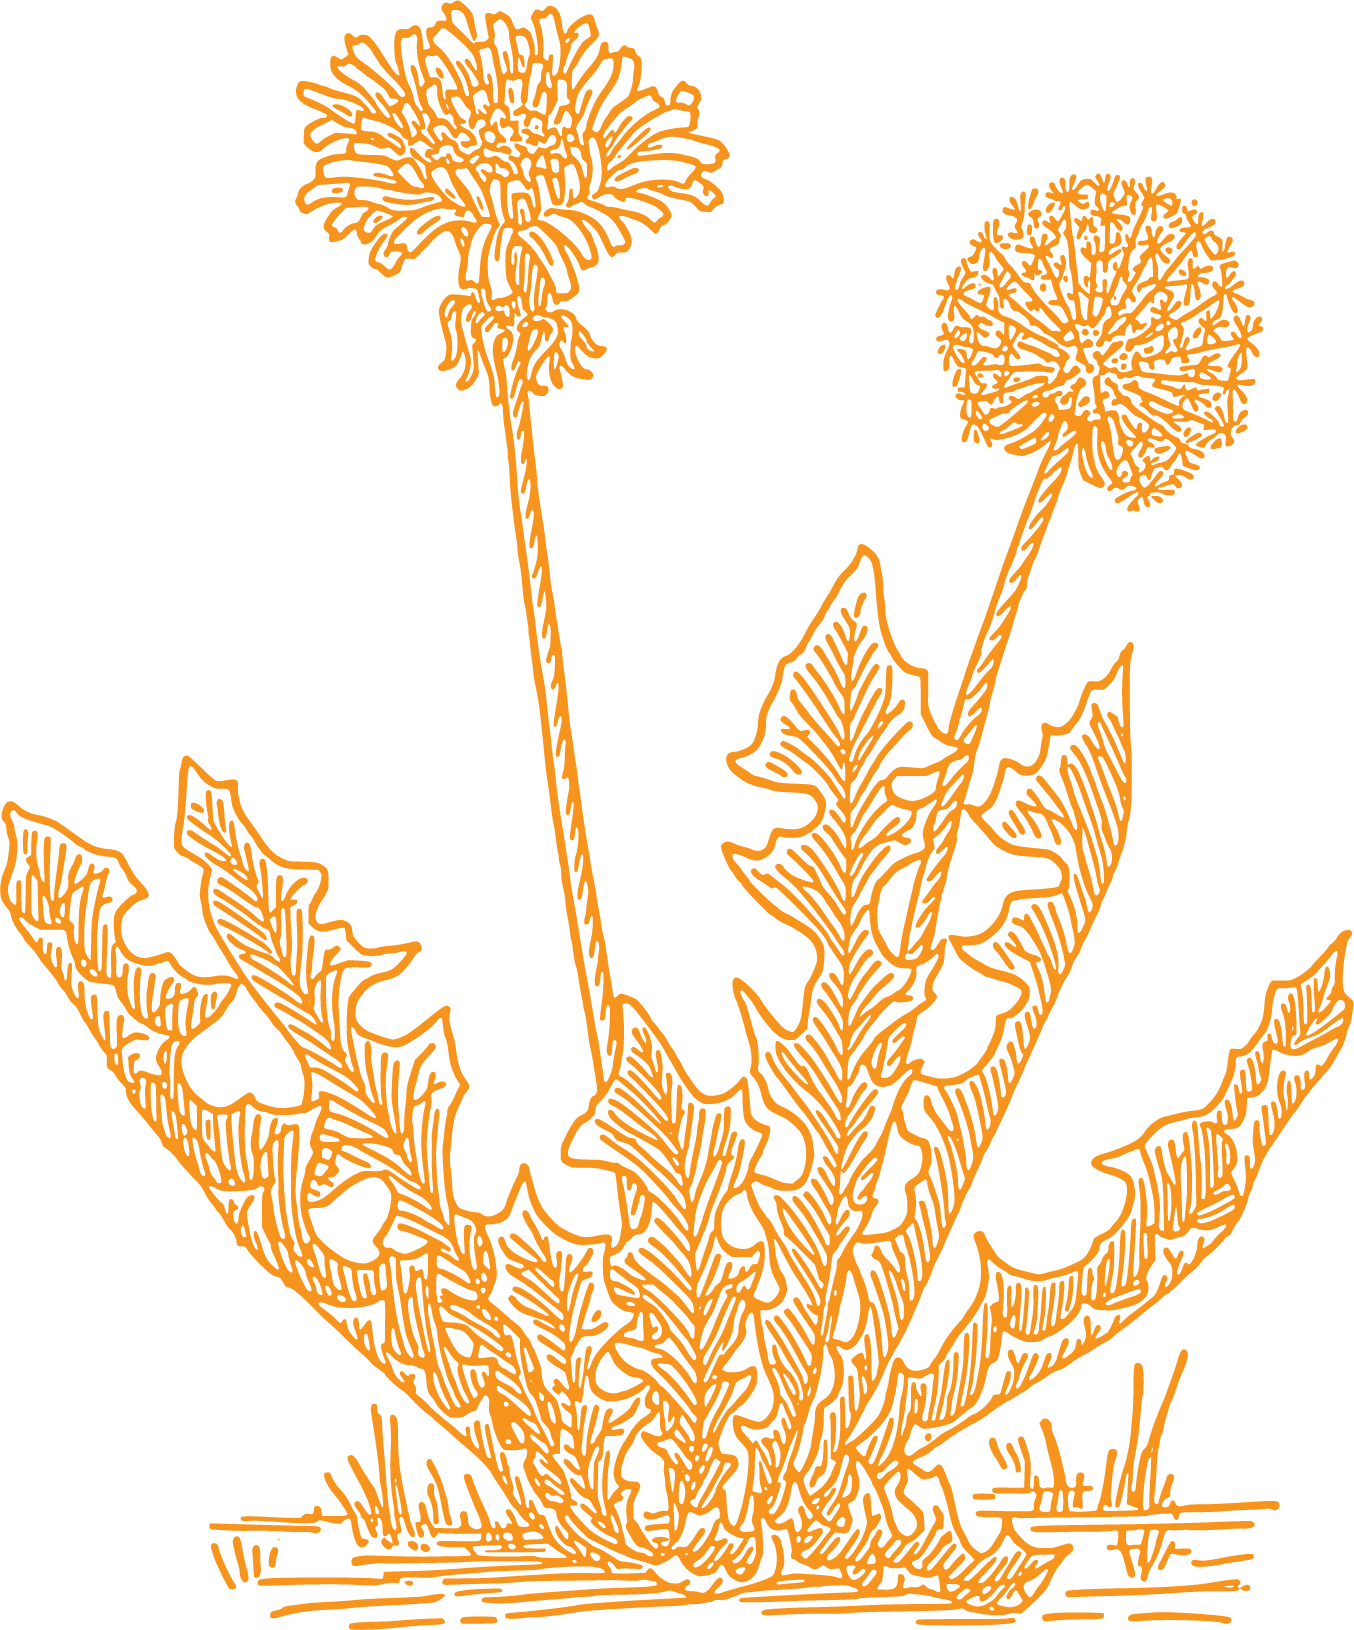 Dandelion artists logo